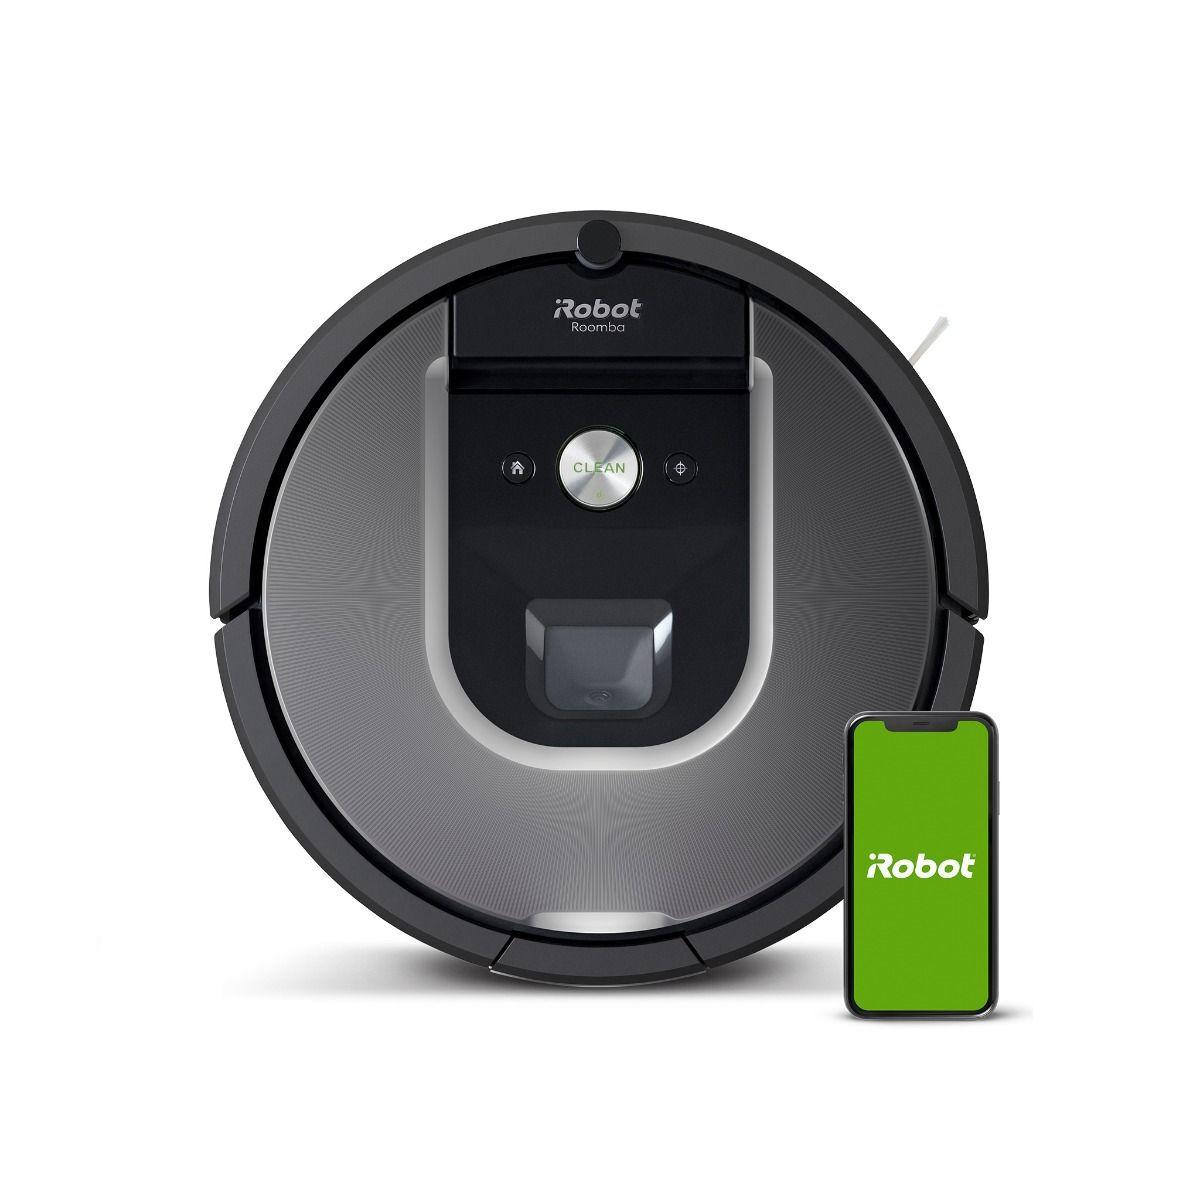 Irobot Roomba 975 aspirapolvere robot 0,6 L Senza sacchetto Grigio